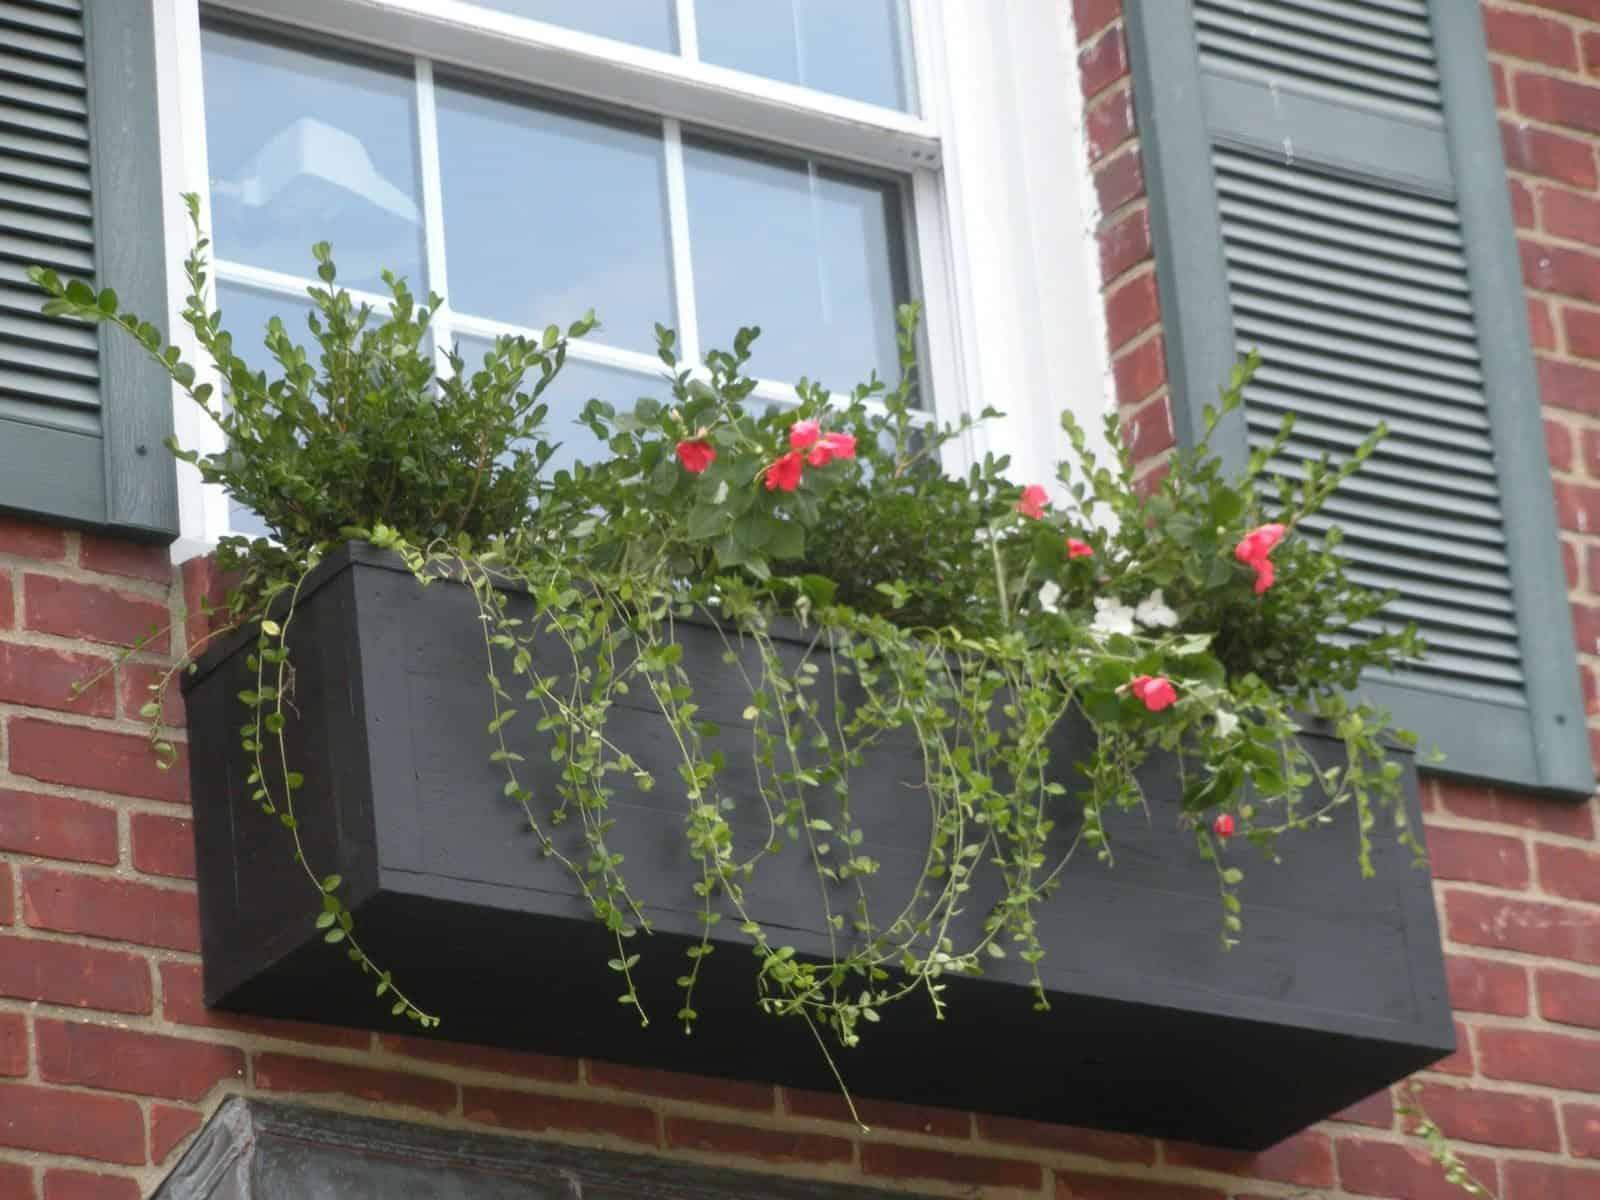 1' x 3' Cedar Planter Box planted with Ilex, Impatients, and Vinca Minor - Rockville Center, Long Island NY